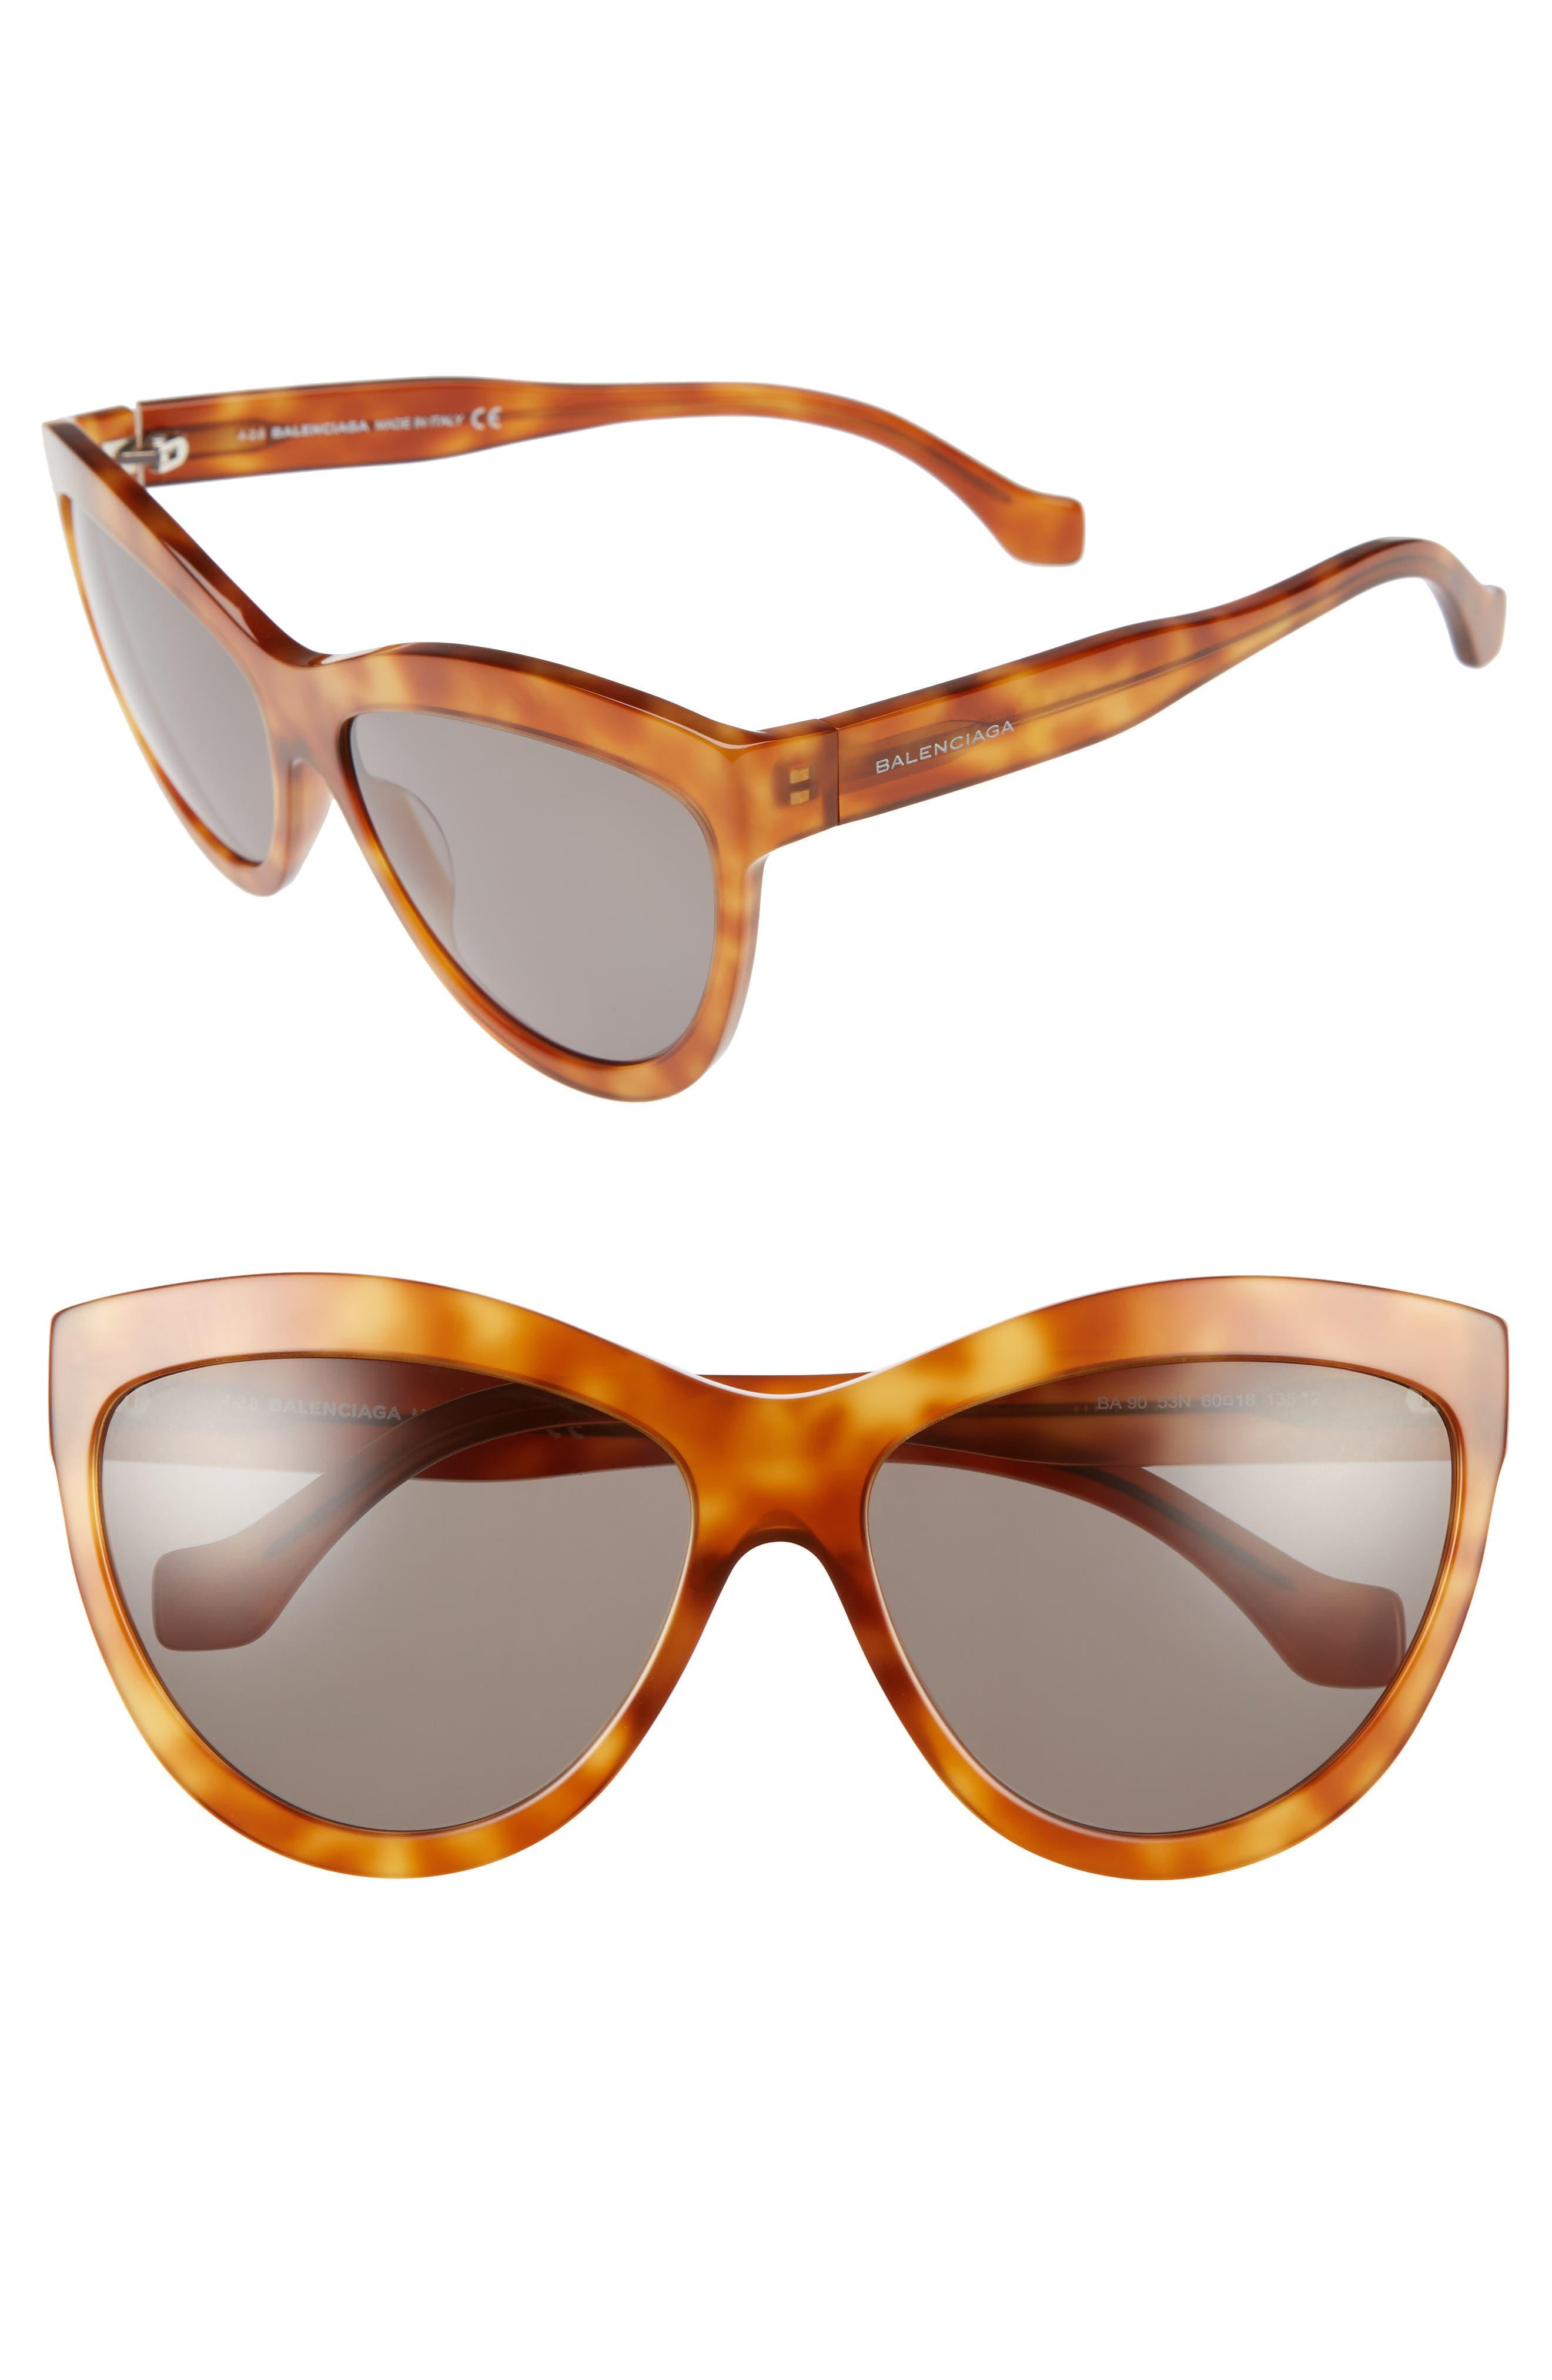 60mm Sunglasses,                             Alternate thumbnail 2, color,                             LIGHT HAVANA/ SILVER/ GREEN